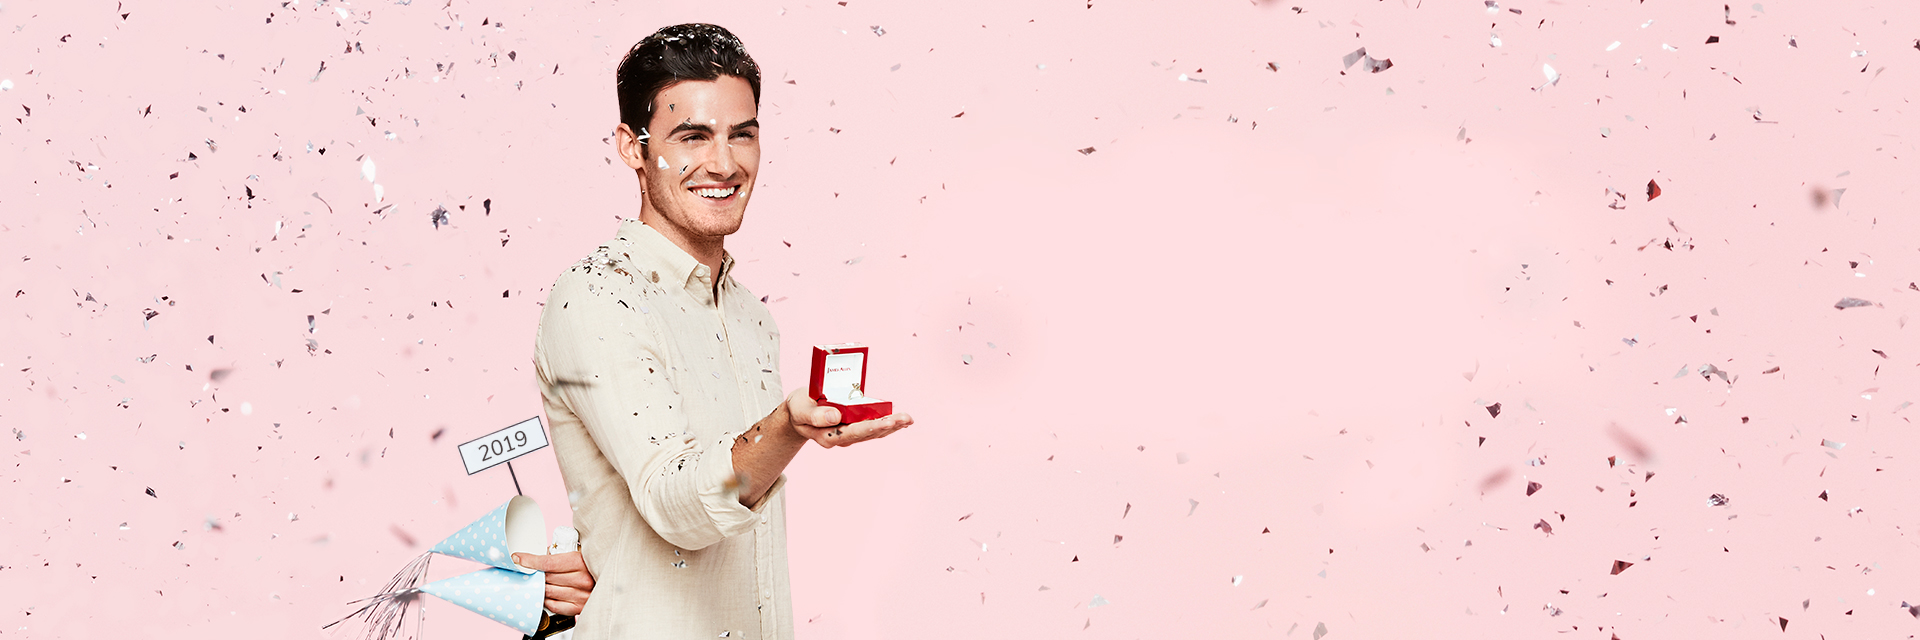 shop engagement rings and loose diamonds online jamesallen com